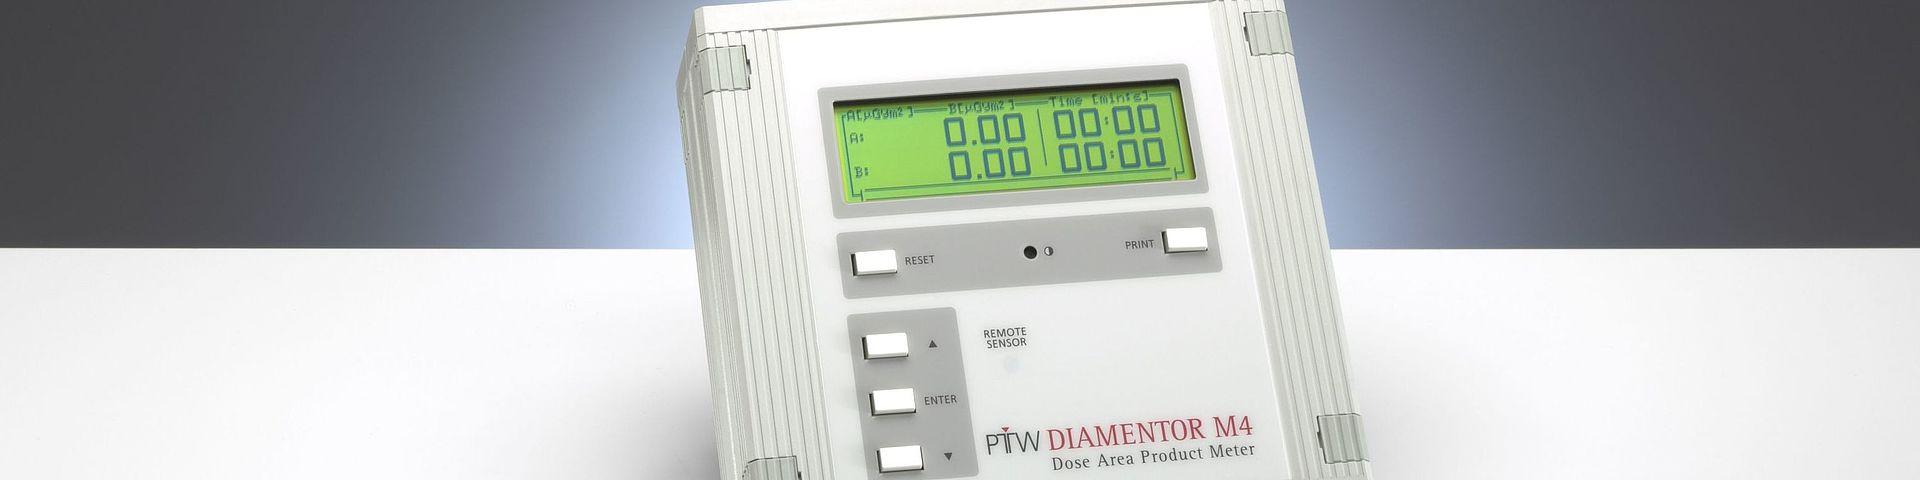 DIAMENTOR M4 - PTW Freiburg GmbH